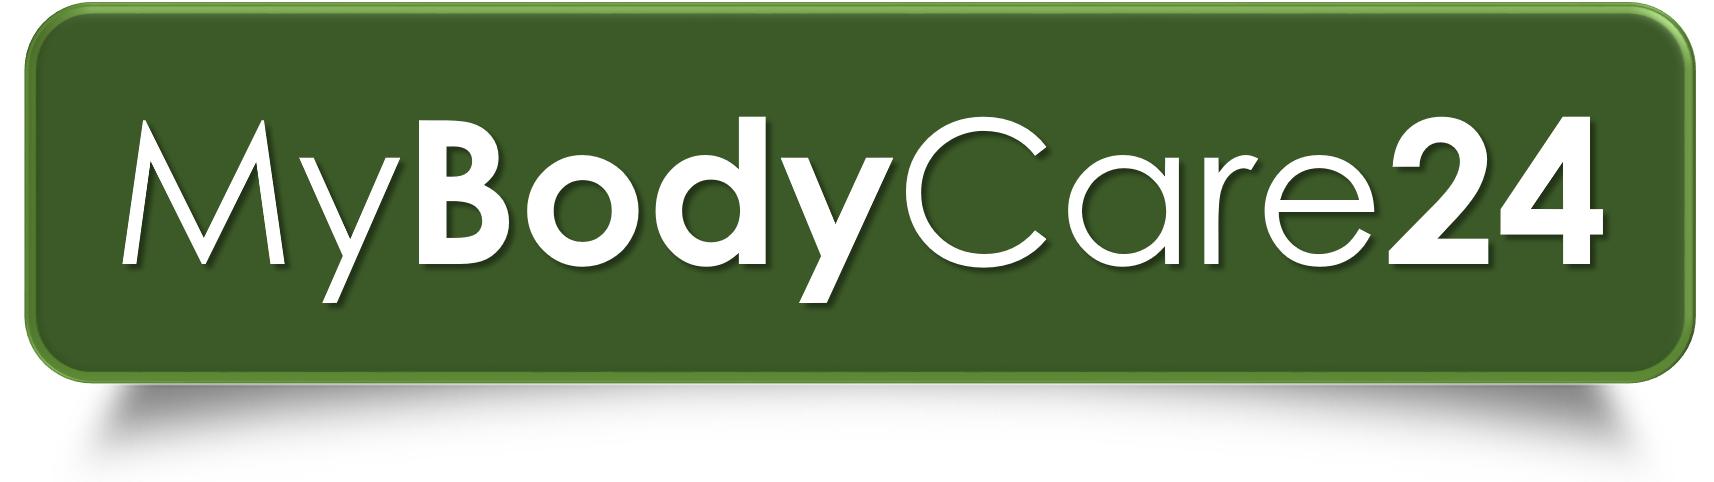 MyBodyCare24-Logo